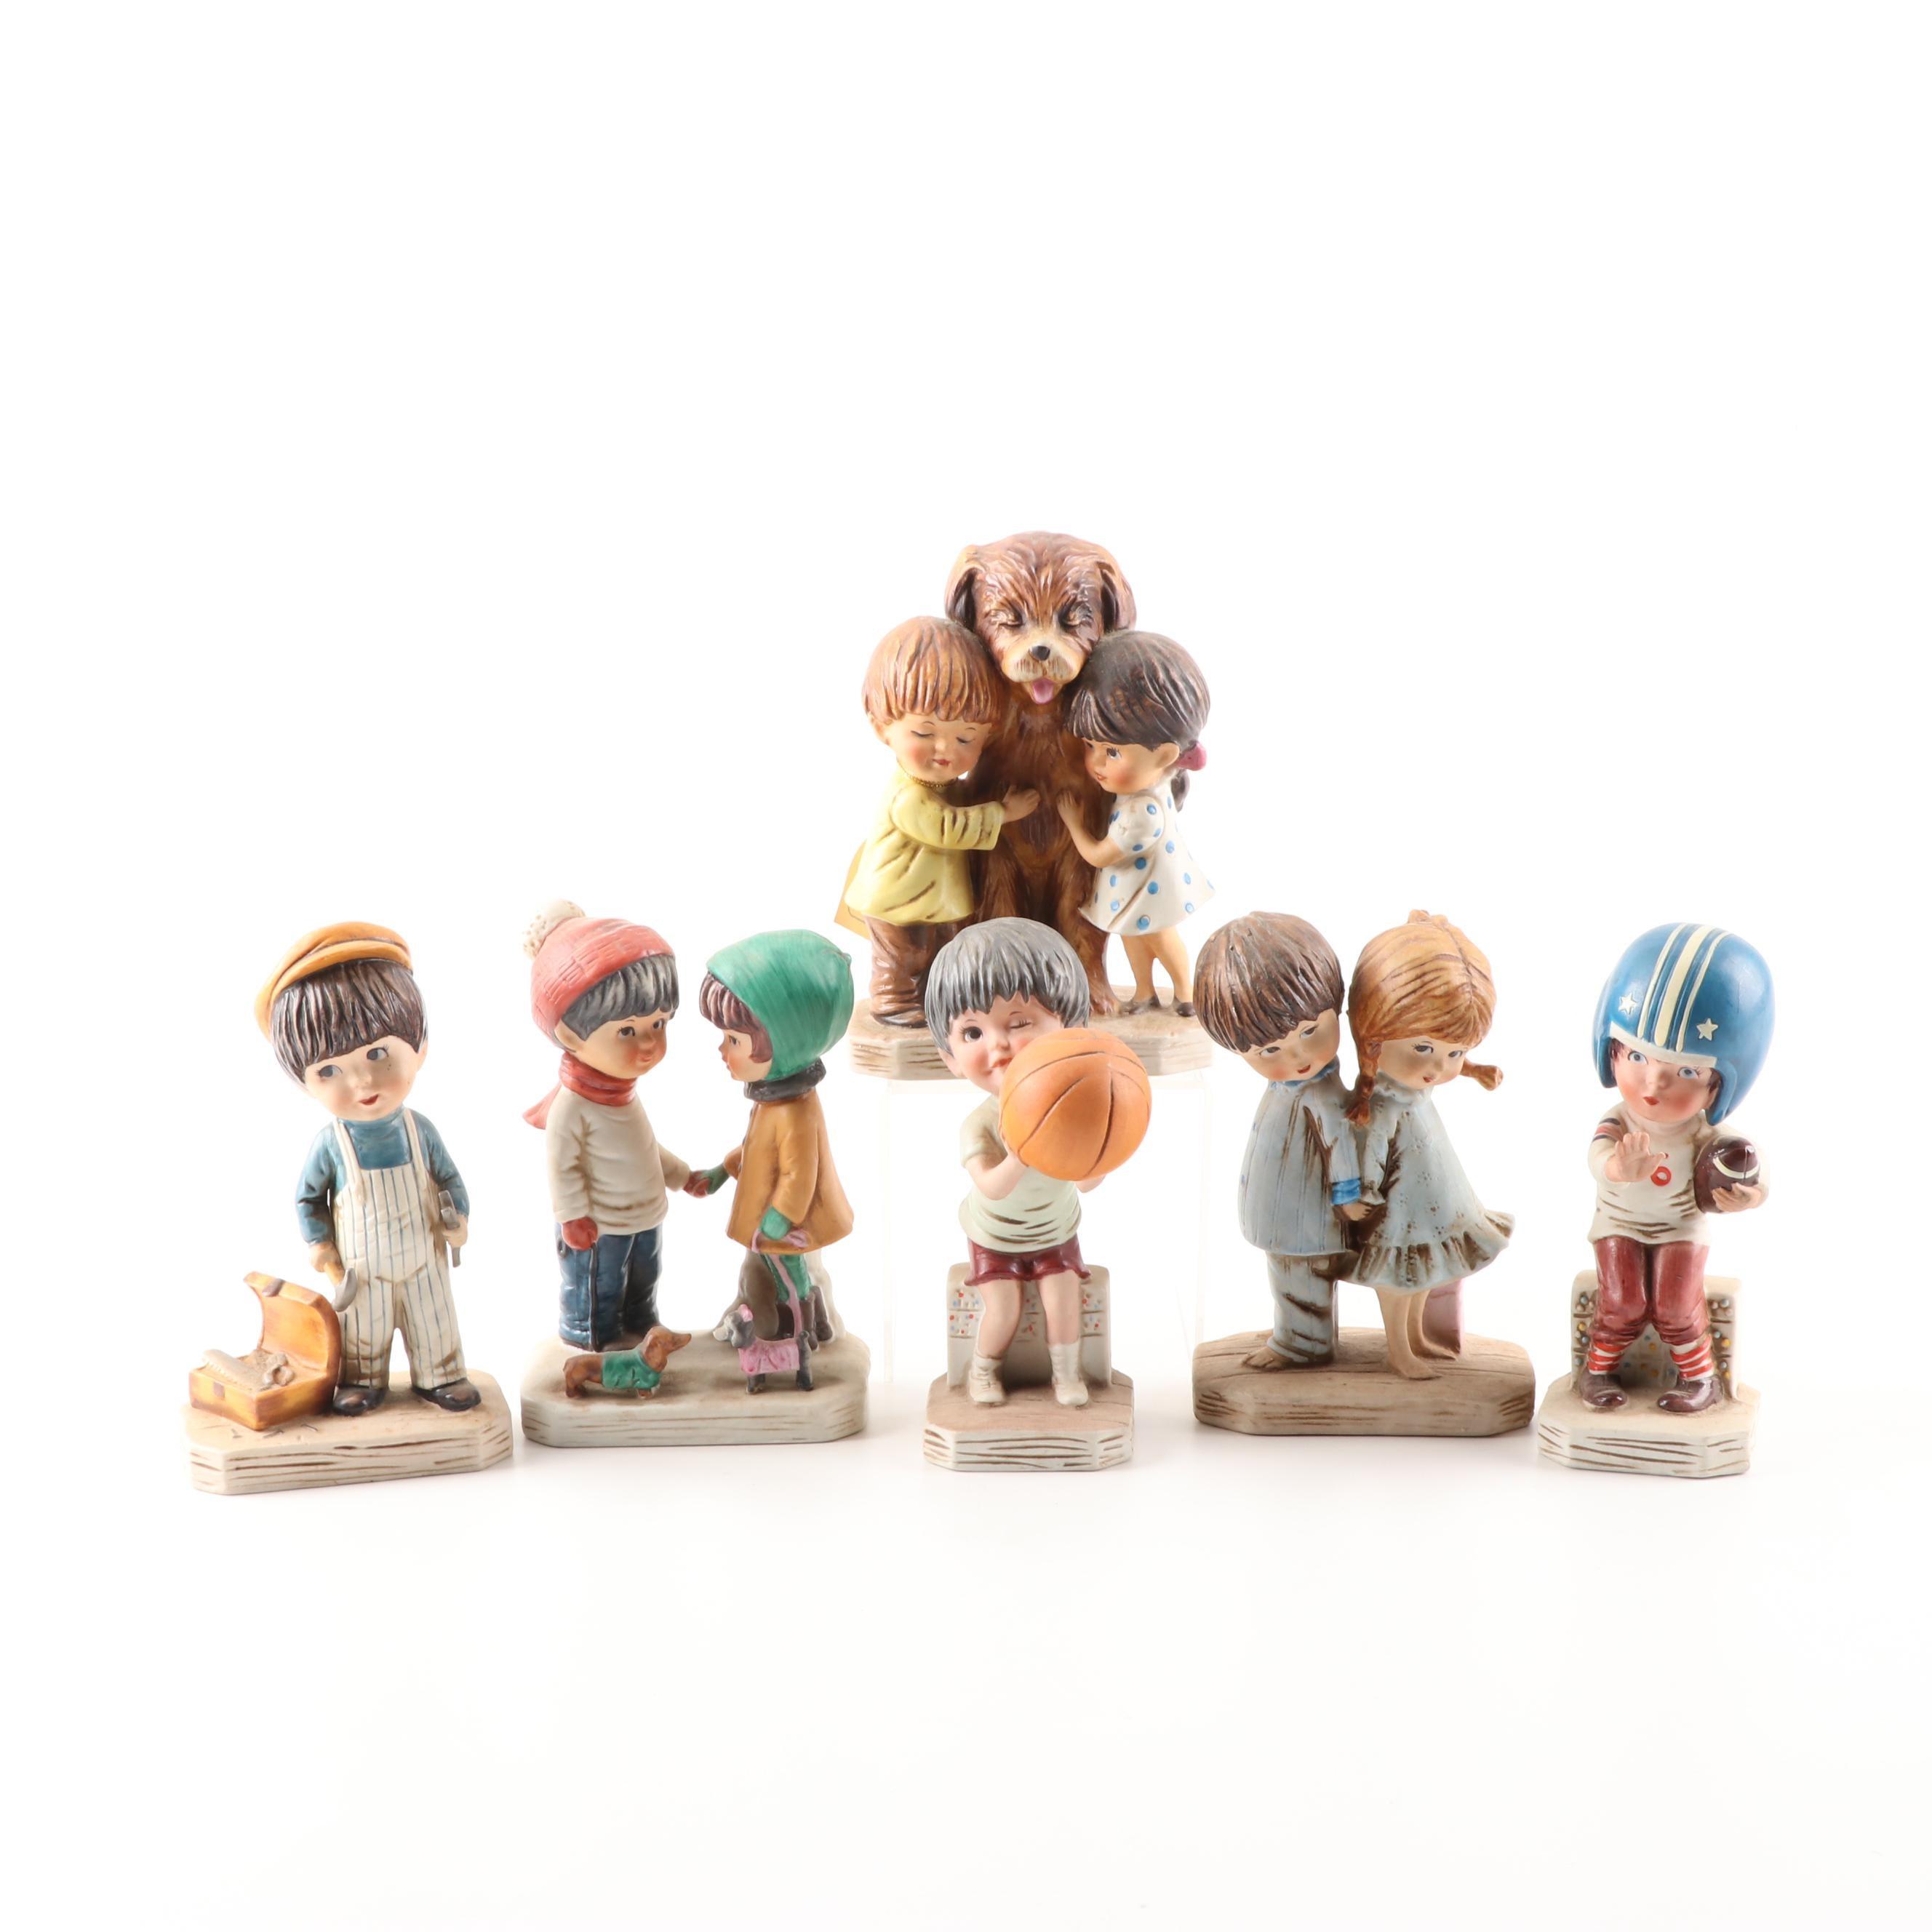 Gorham Porcelain Moppets Figurines, 1970s